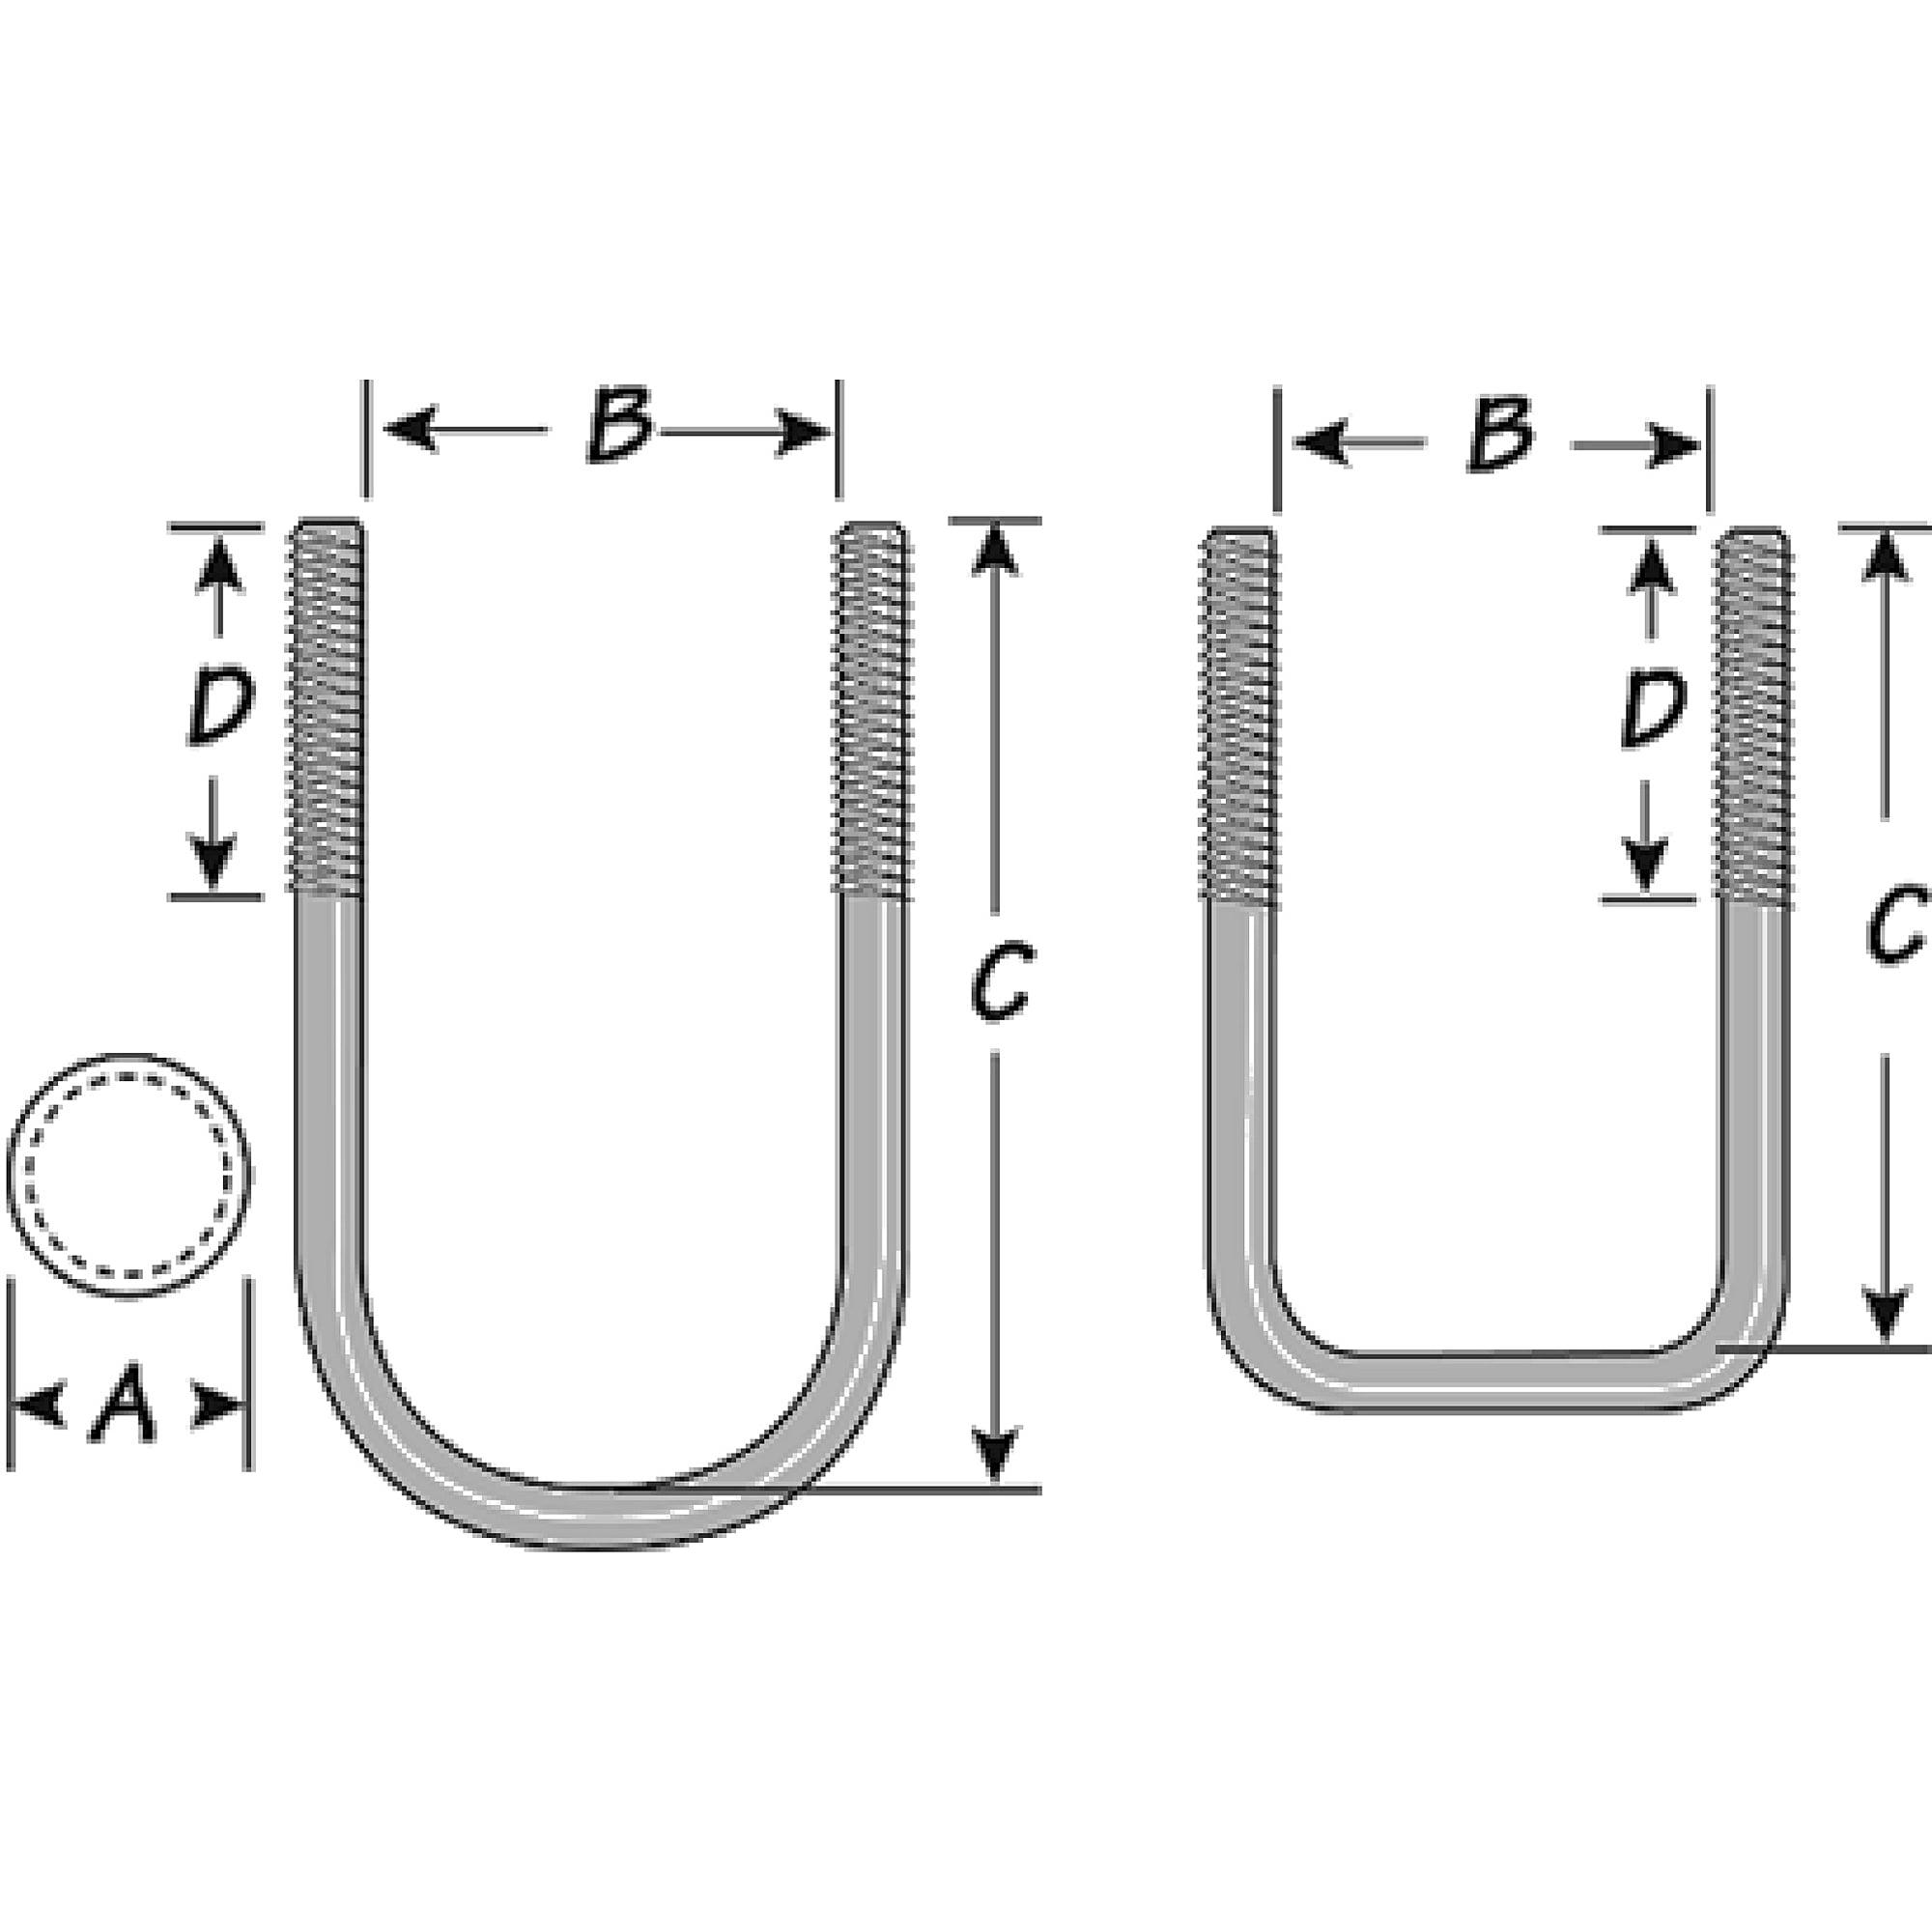 Tie Down Engineering Galvanized U-Bolt Kit